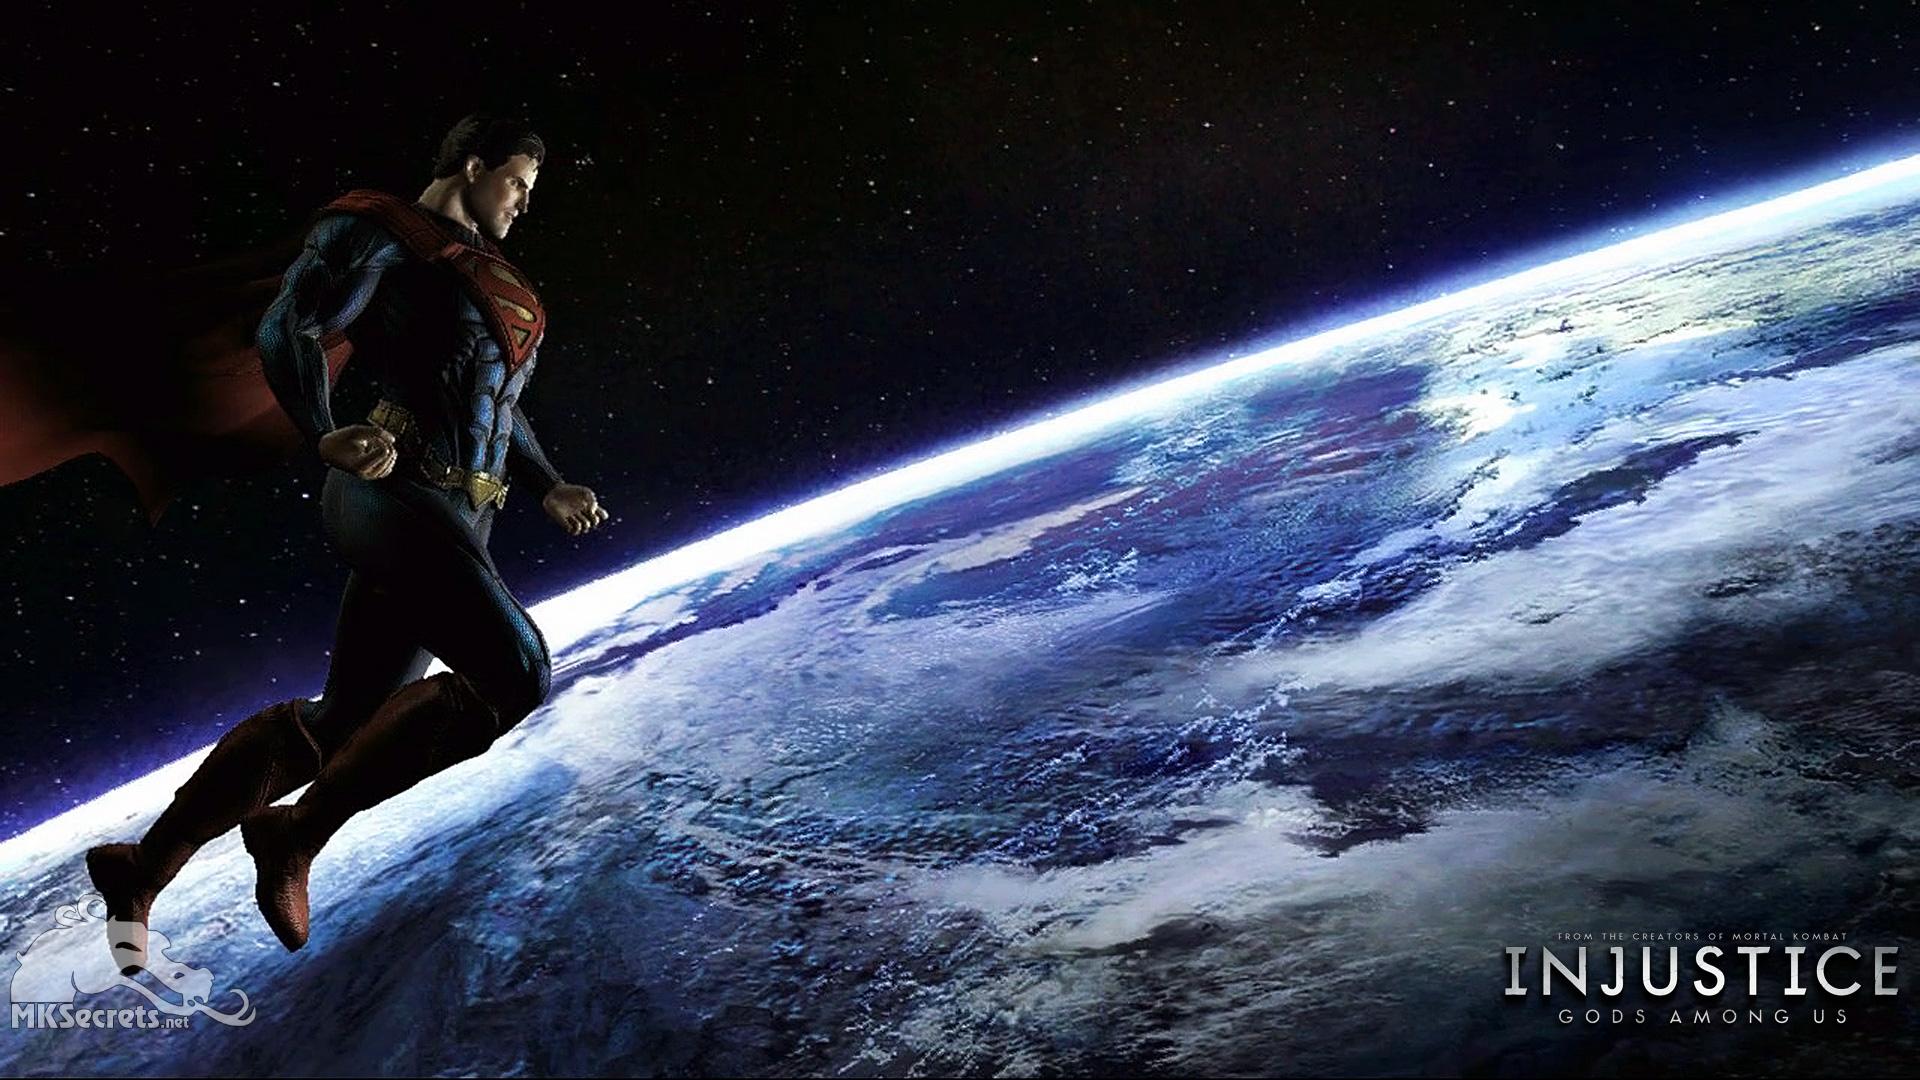 Injustice 2 Superman Hd Games 4k Wallpapers Images: - Mortal Kombat Secrets